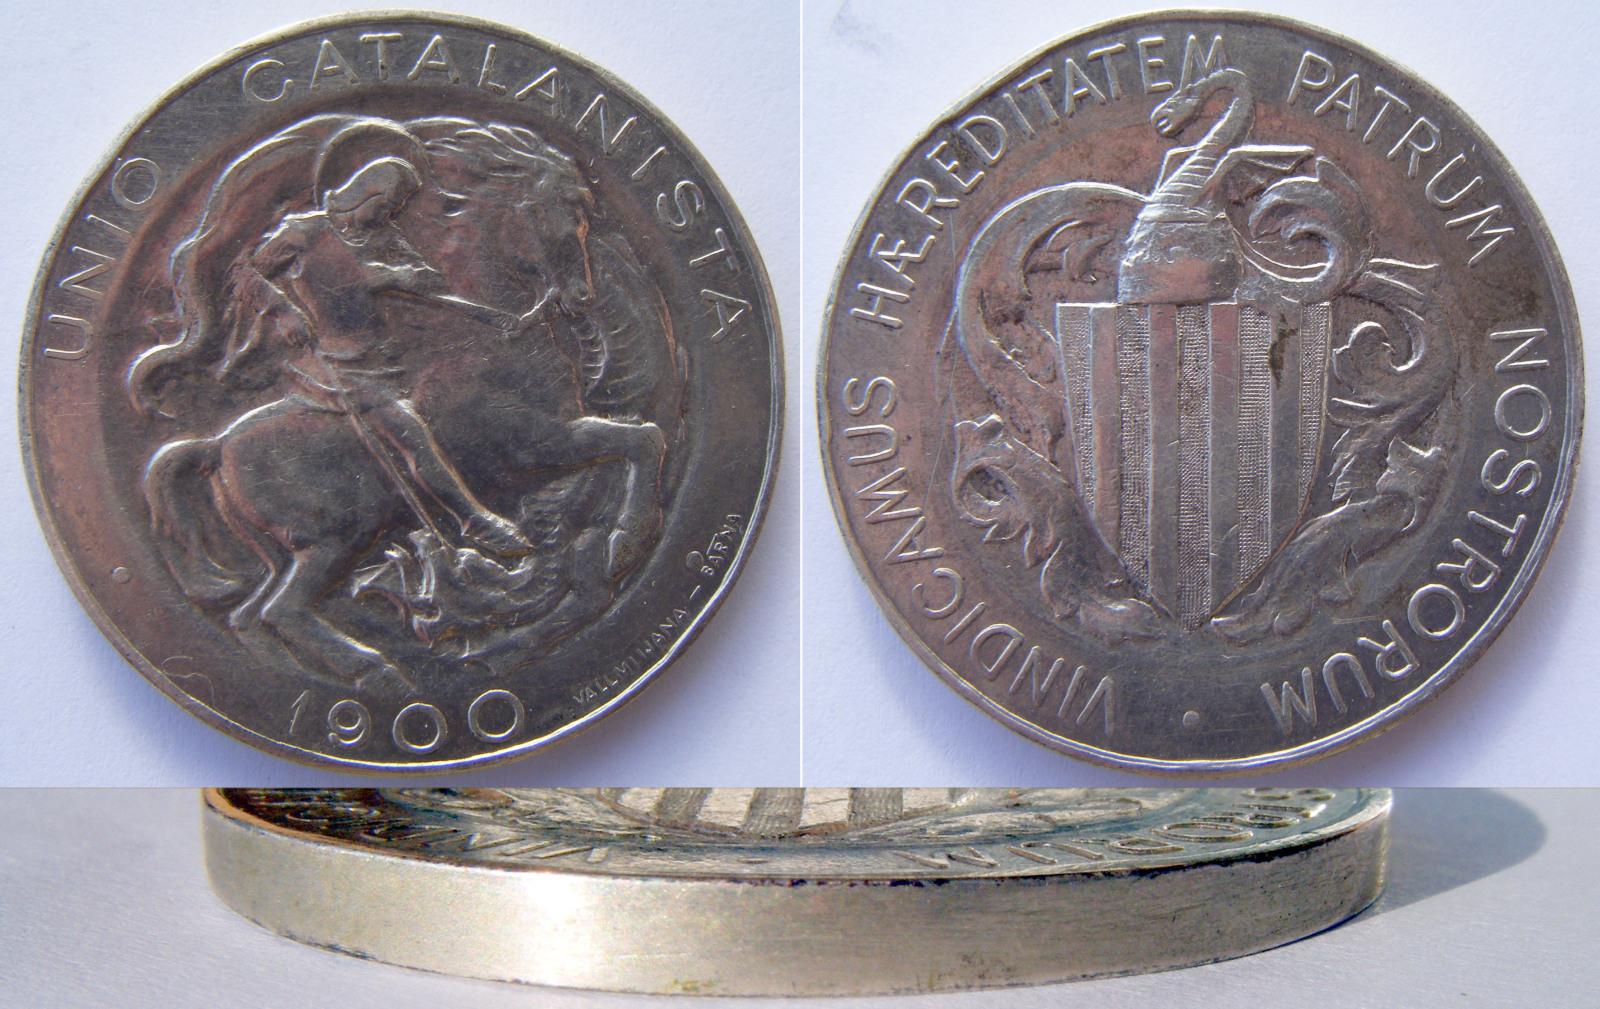 Monedas catalanas. Jzzeop